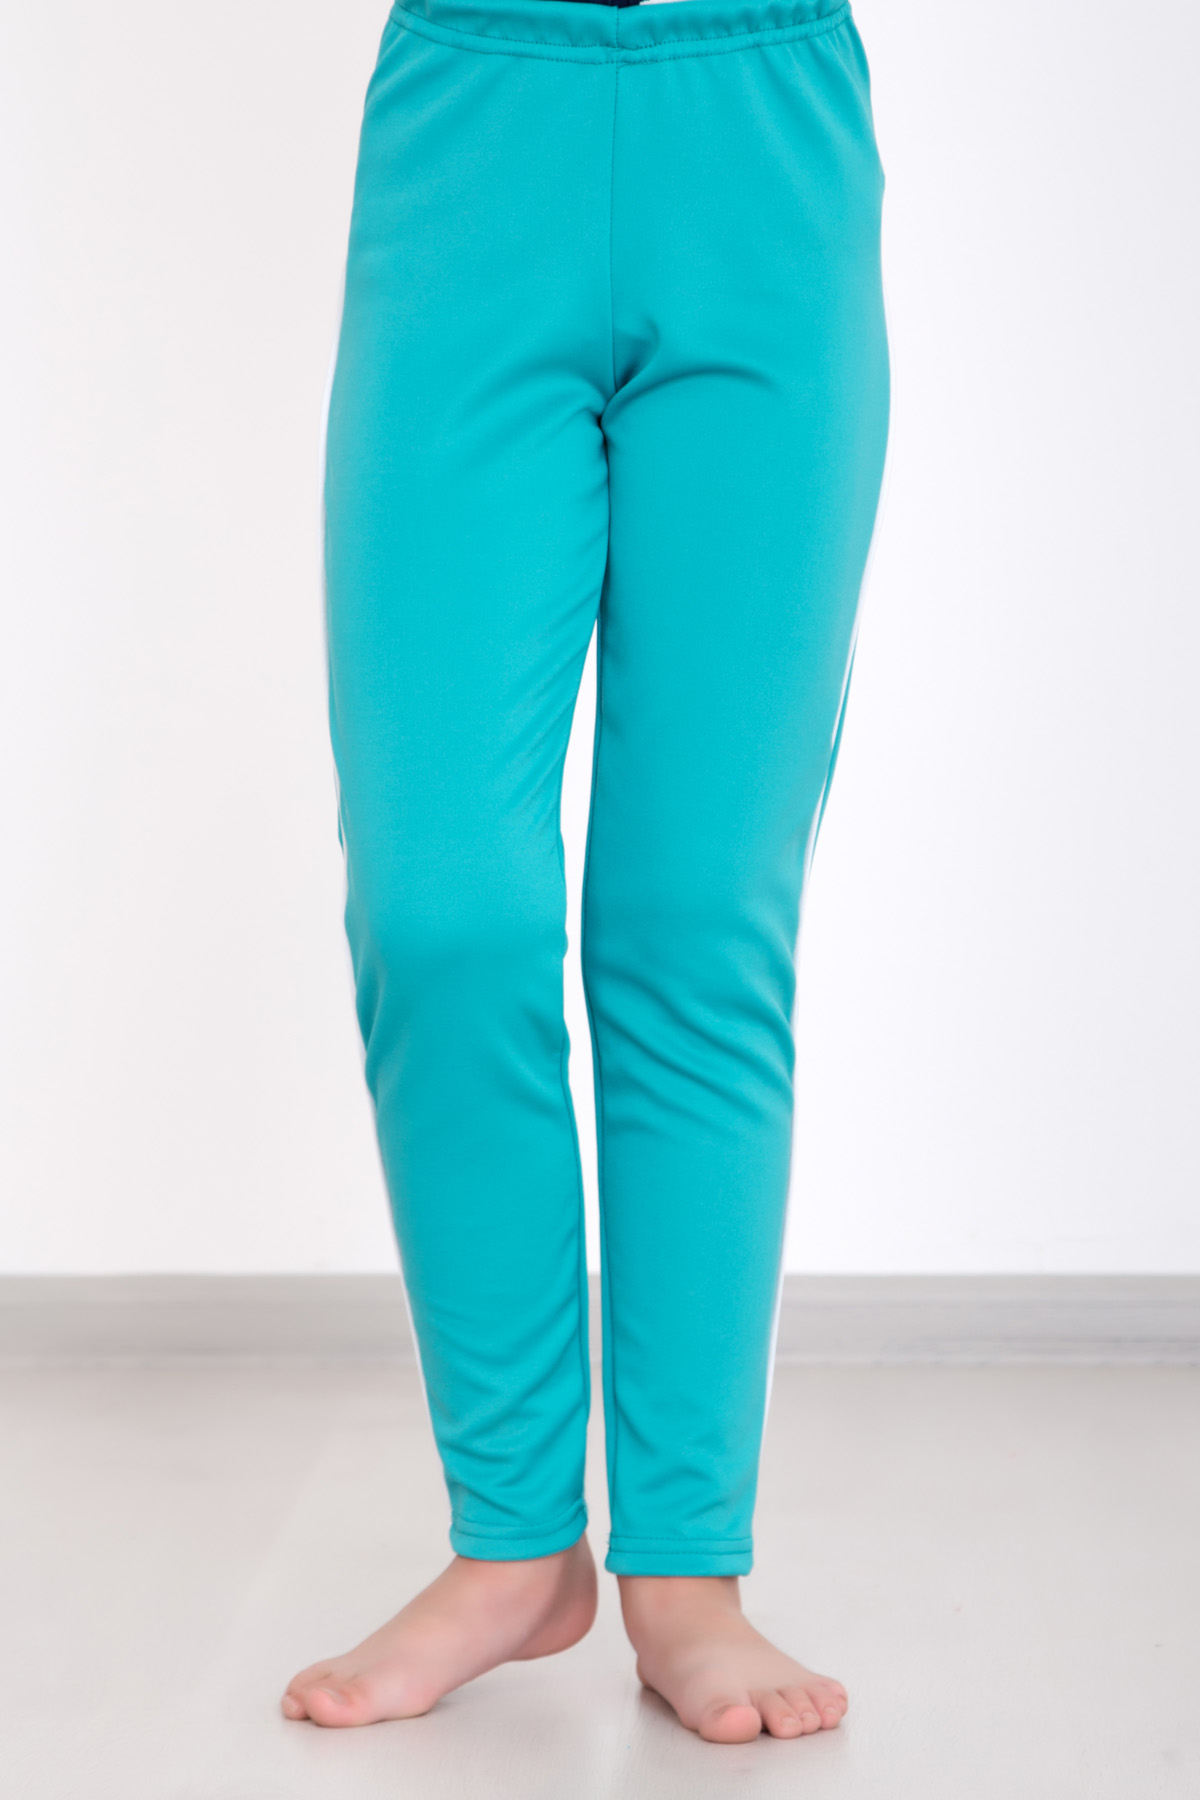 Дет. брюки Спорт Ментол р. 32Распродажа<br><br><br>Тип: Дет. брюки<br>Размер: 32<br>Материал: Полиэстер